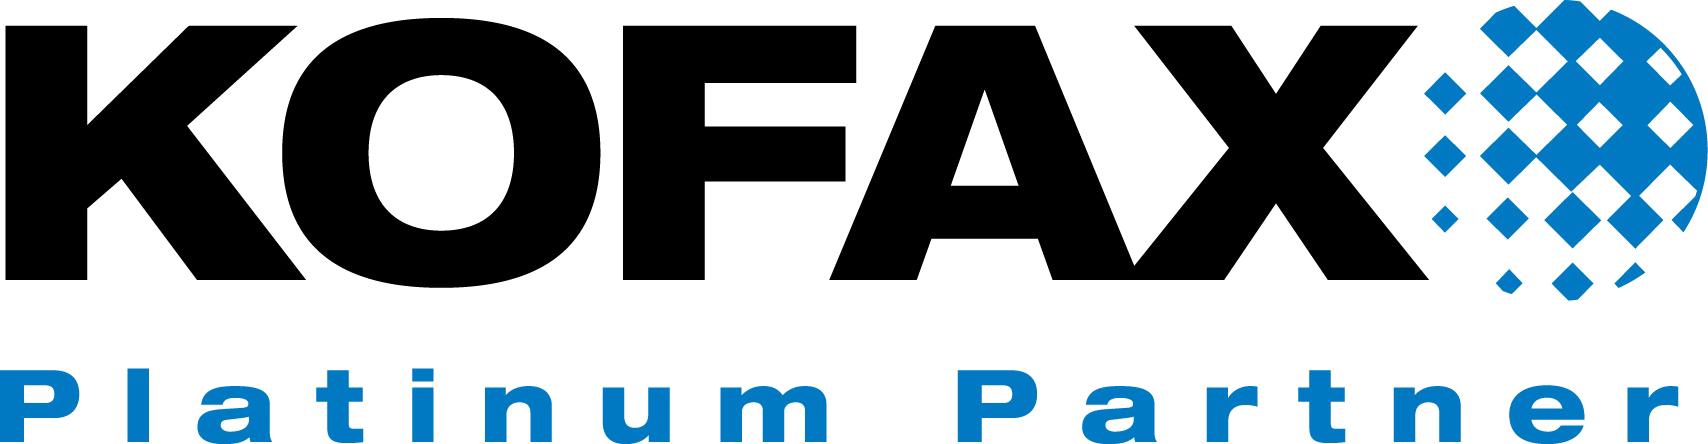 Kofax Partner Logo Platinum